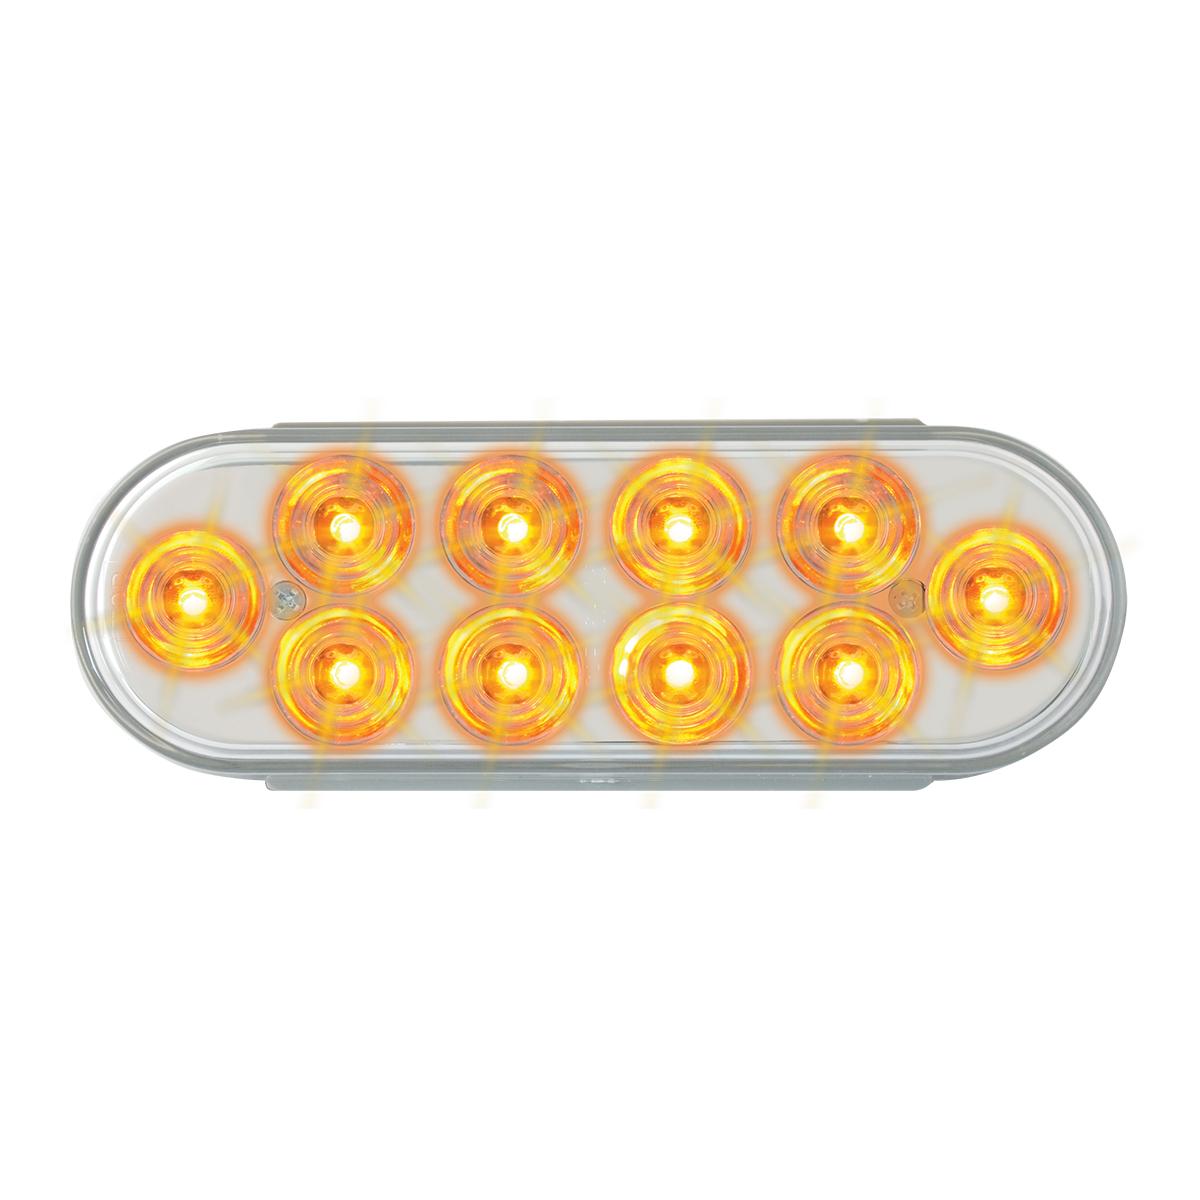 76861 Oval Mega 10 Plus LED Light in Amber/Clear